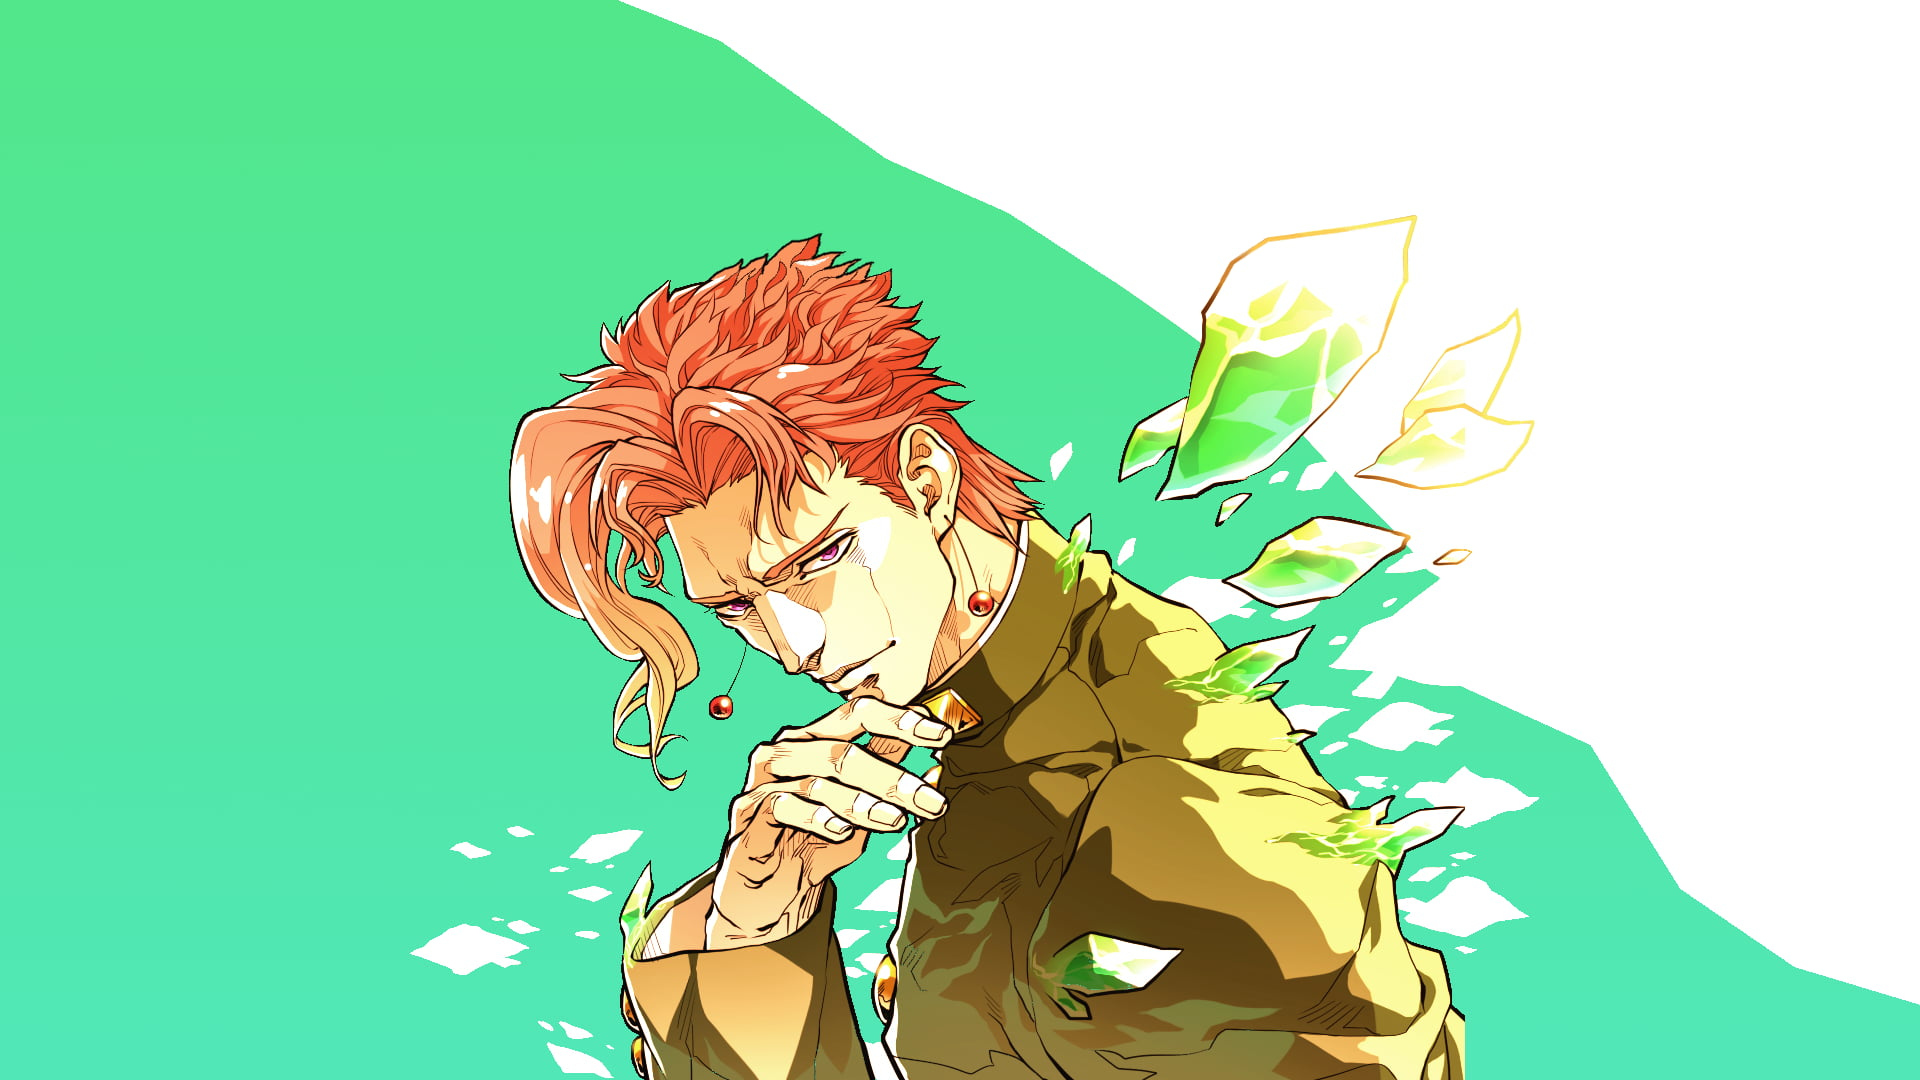 Male anime character anime JoJos Bizarre Adventure Noriaki 1920x1080